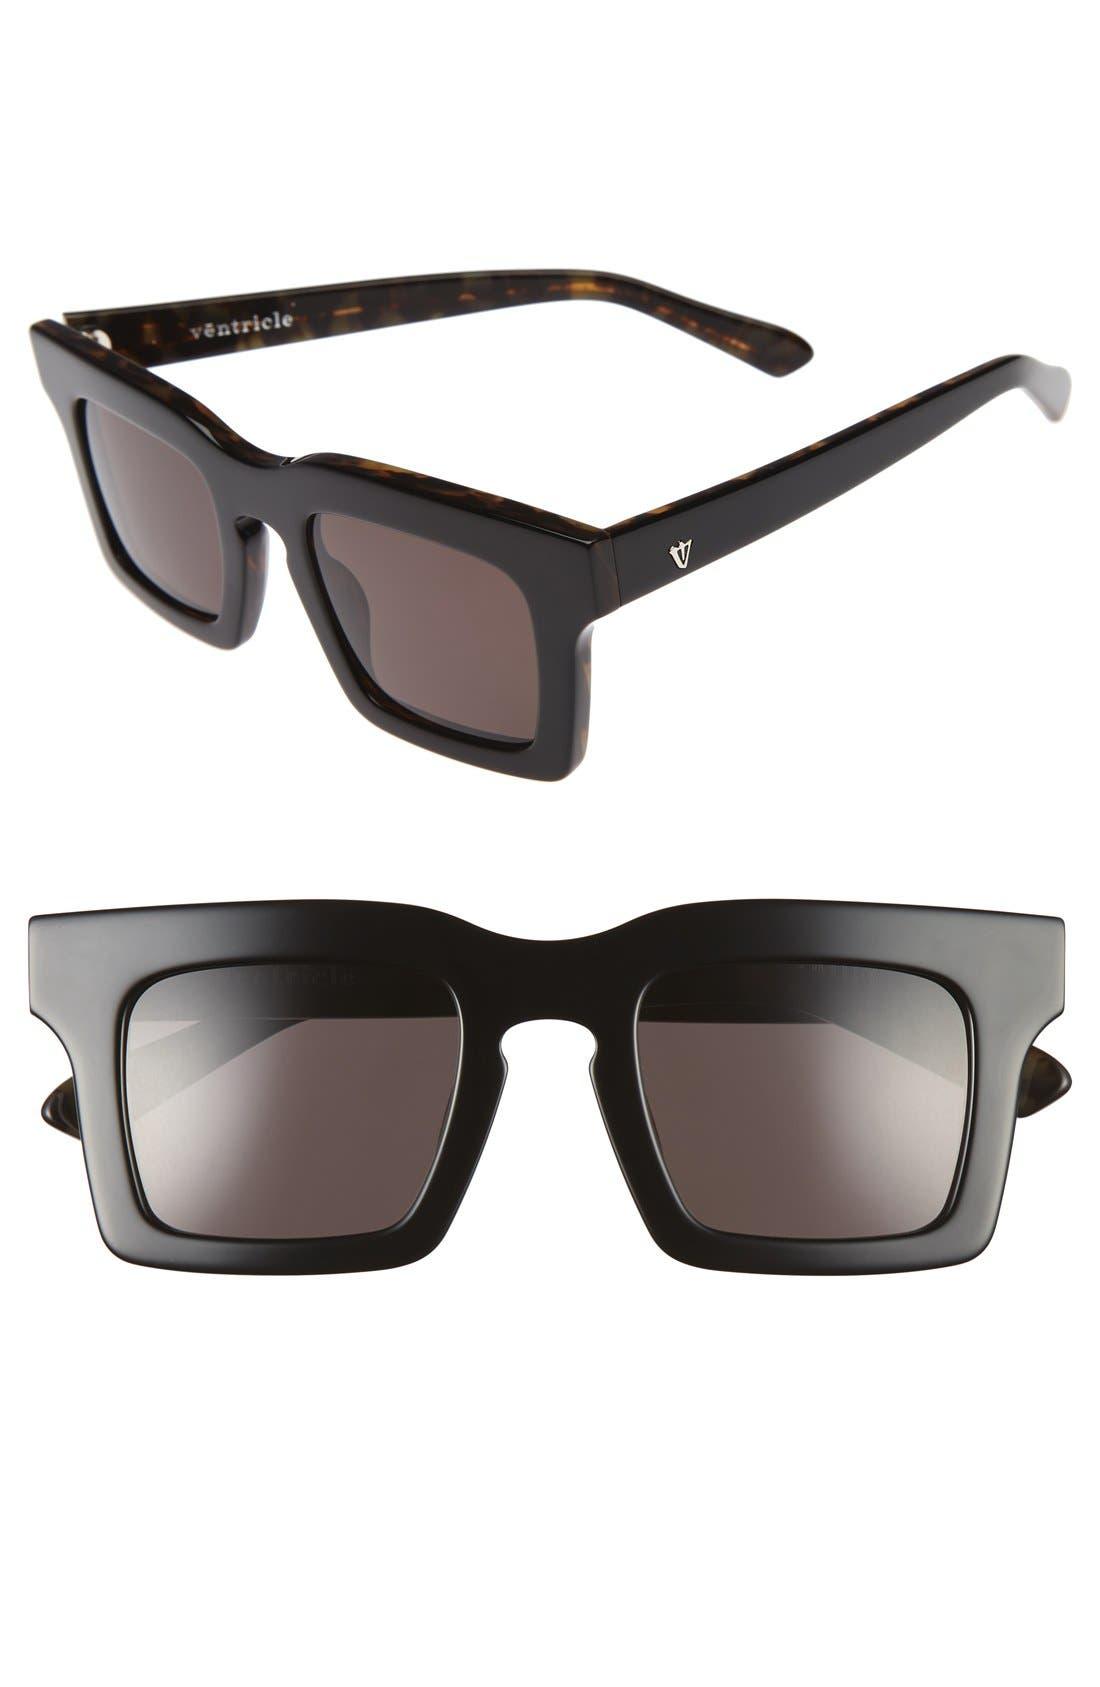 Ventricle 50mm Sunglasses,                             Main thumbnail 1, color,                             001